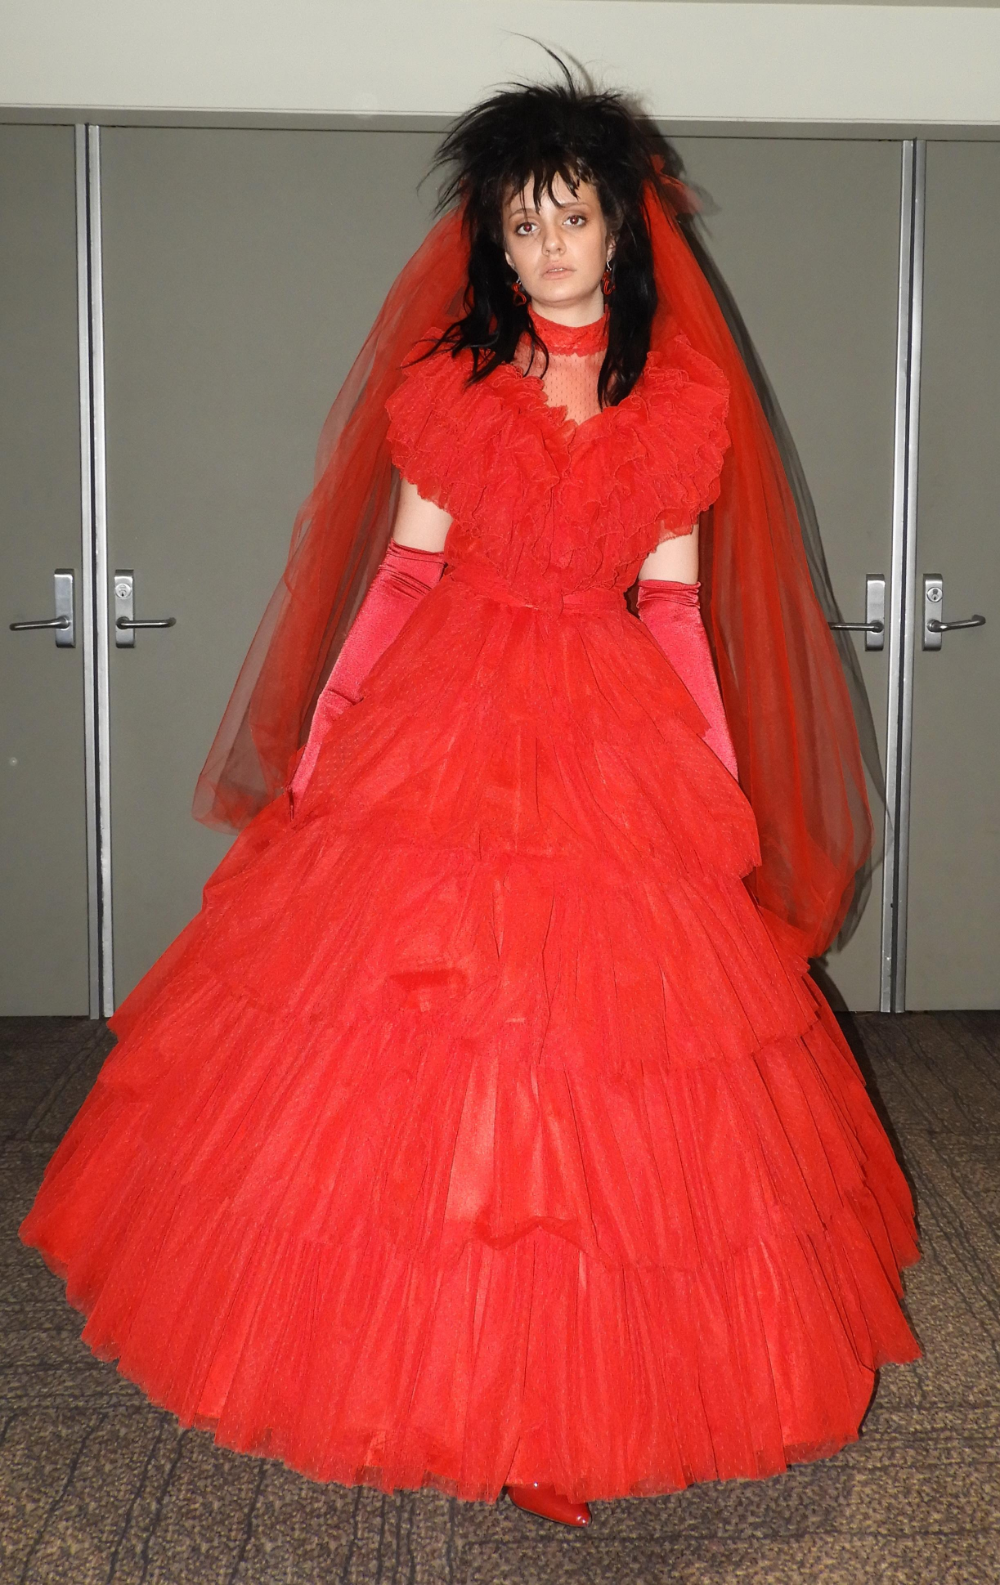 Lydia Red Wedding Dress Beetlejuice In 2020 Red Dress Costume Dresses Beetlejuice Dress